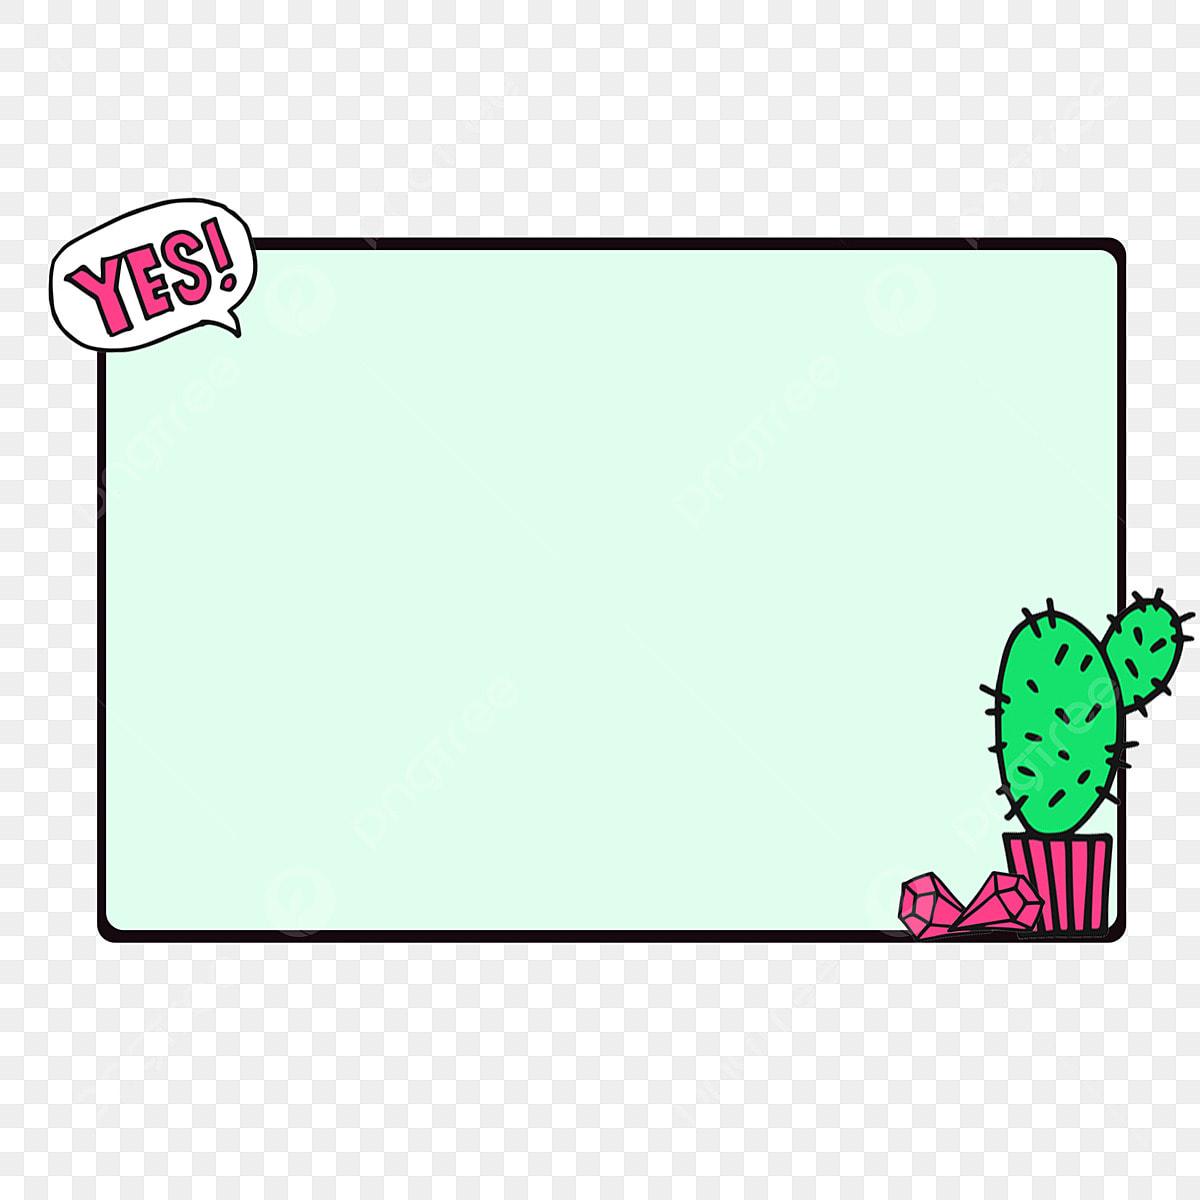 Kartun Sempadan Sempadan Kreatif Kartun Kaktus Segi Empat